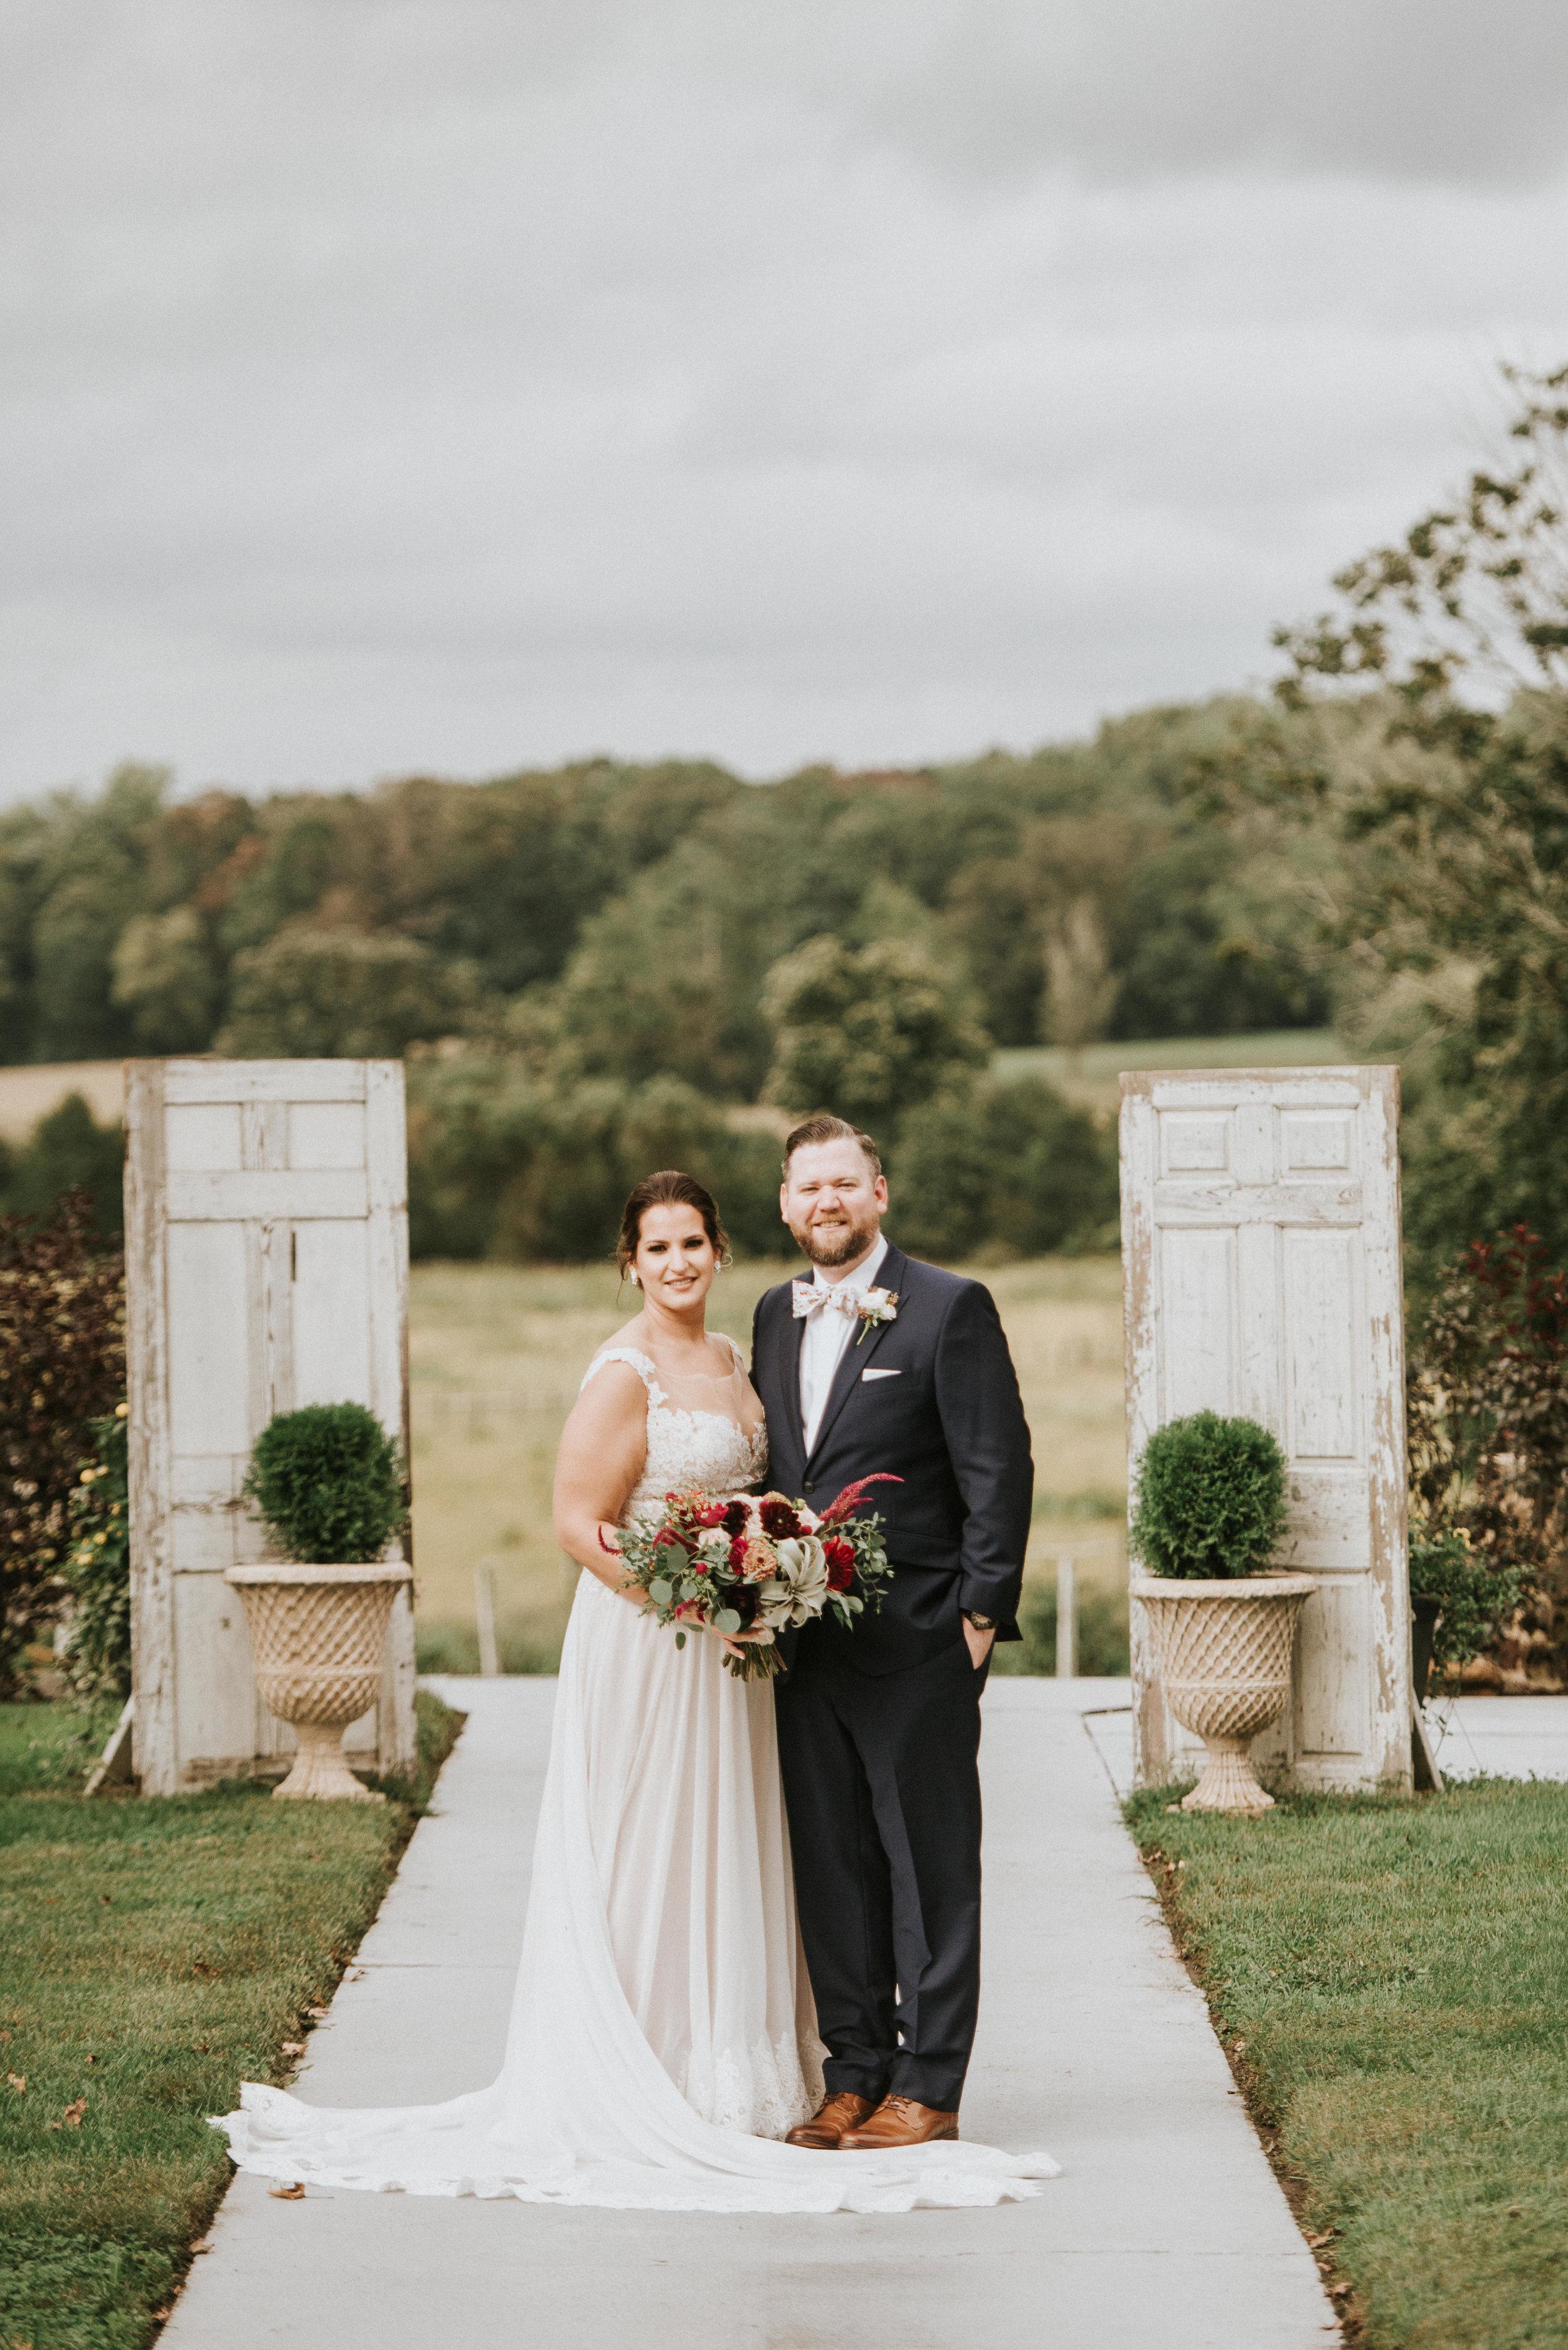 Johnson-Locust-Hall-Farm-Wedding-Christine-Kevin-540.jpg